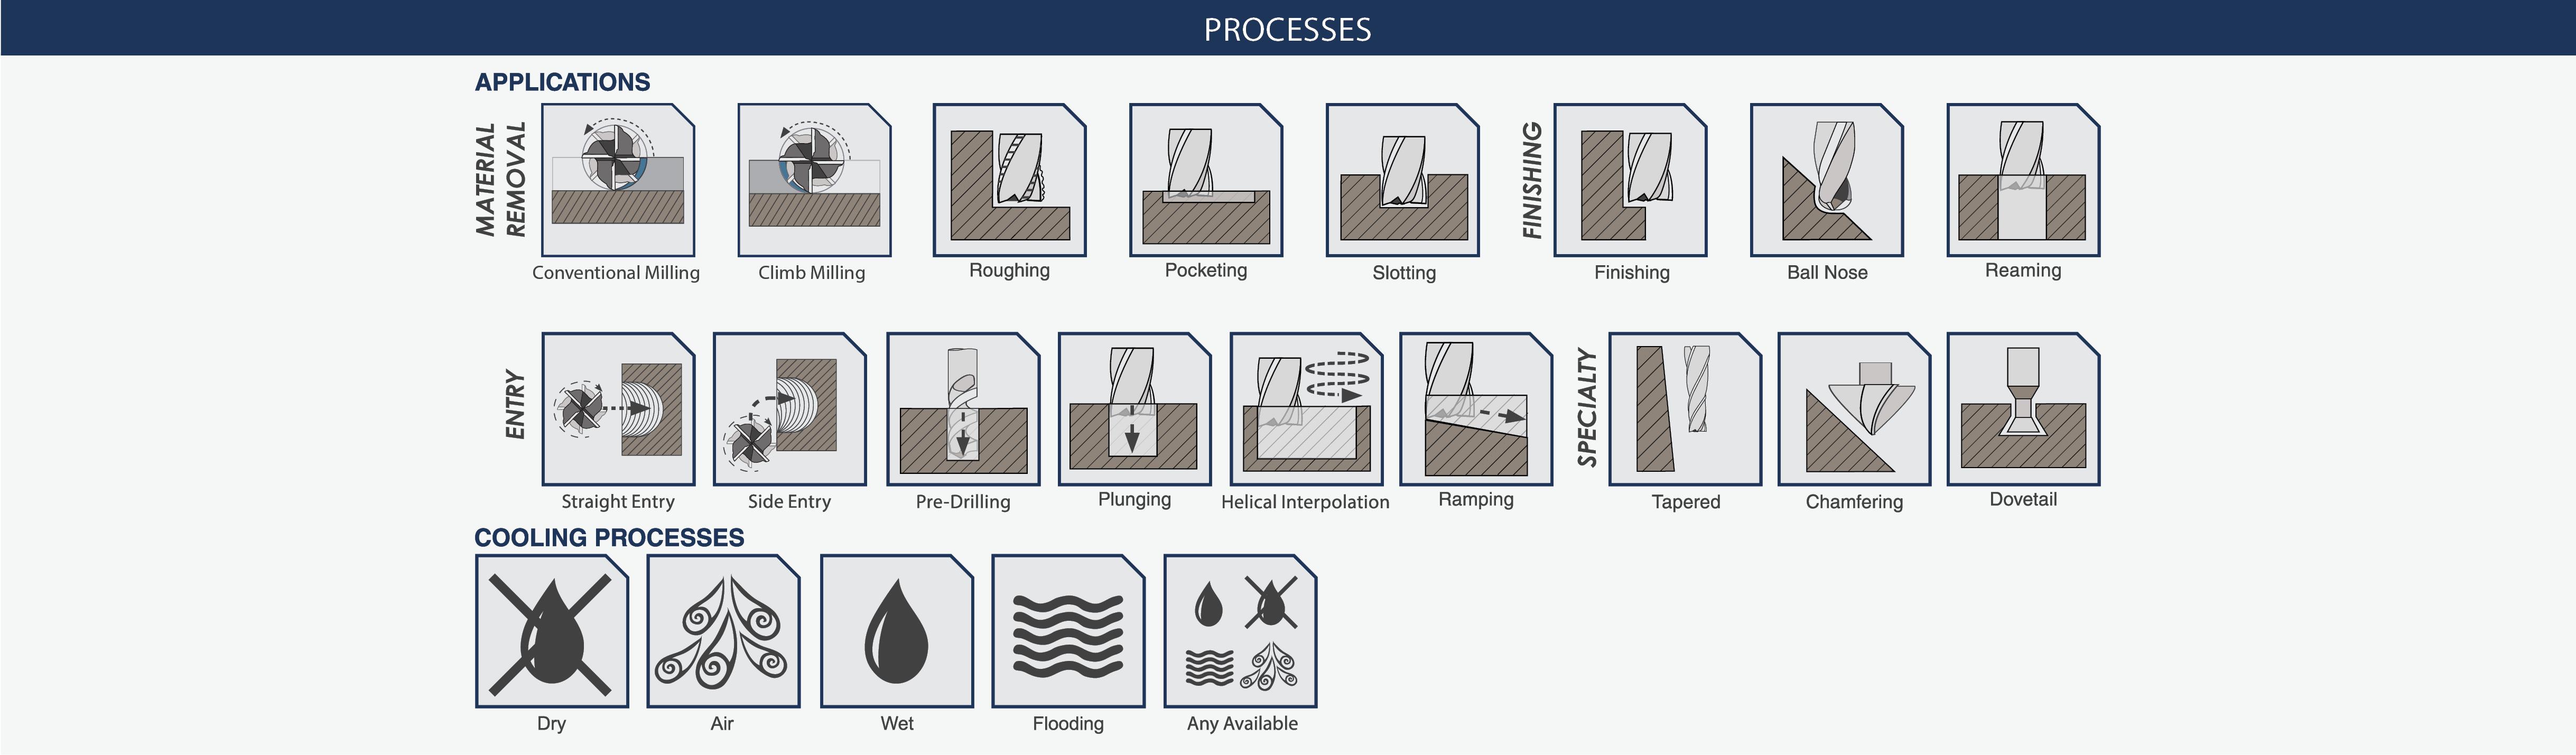 Icon Index Processes